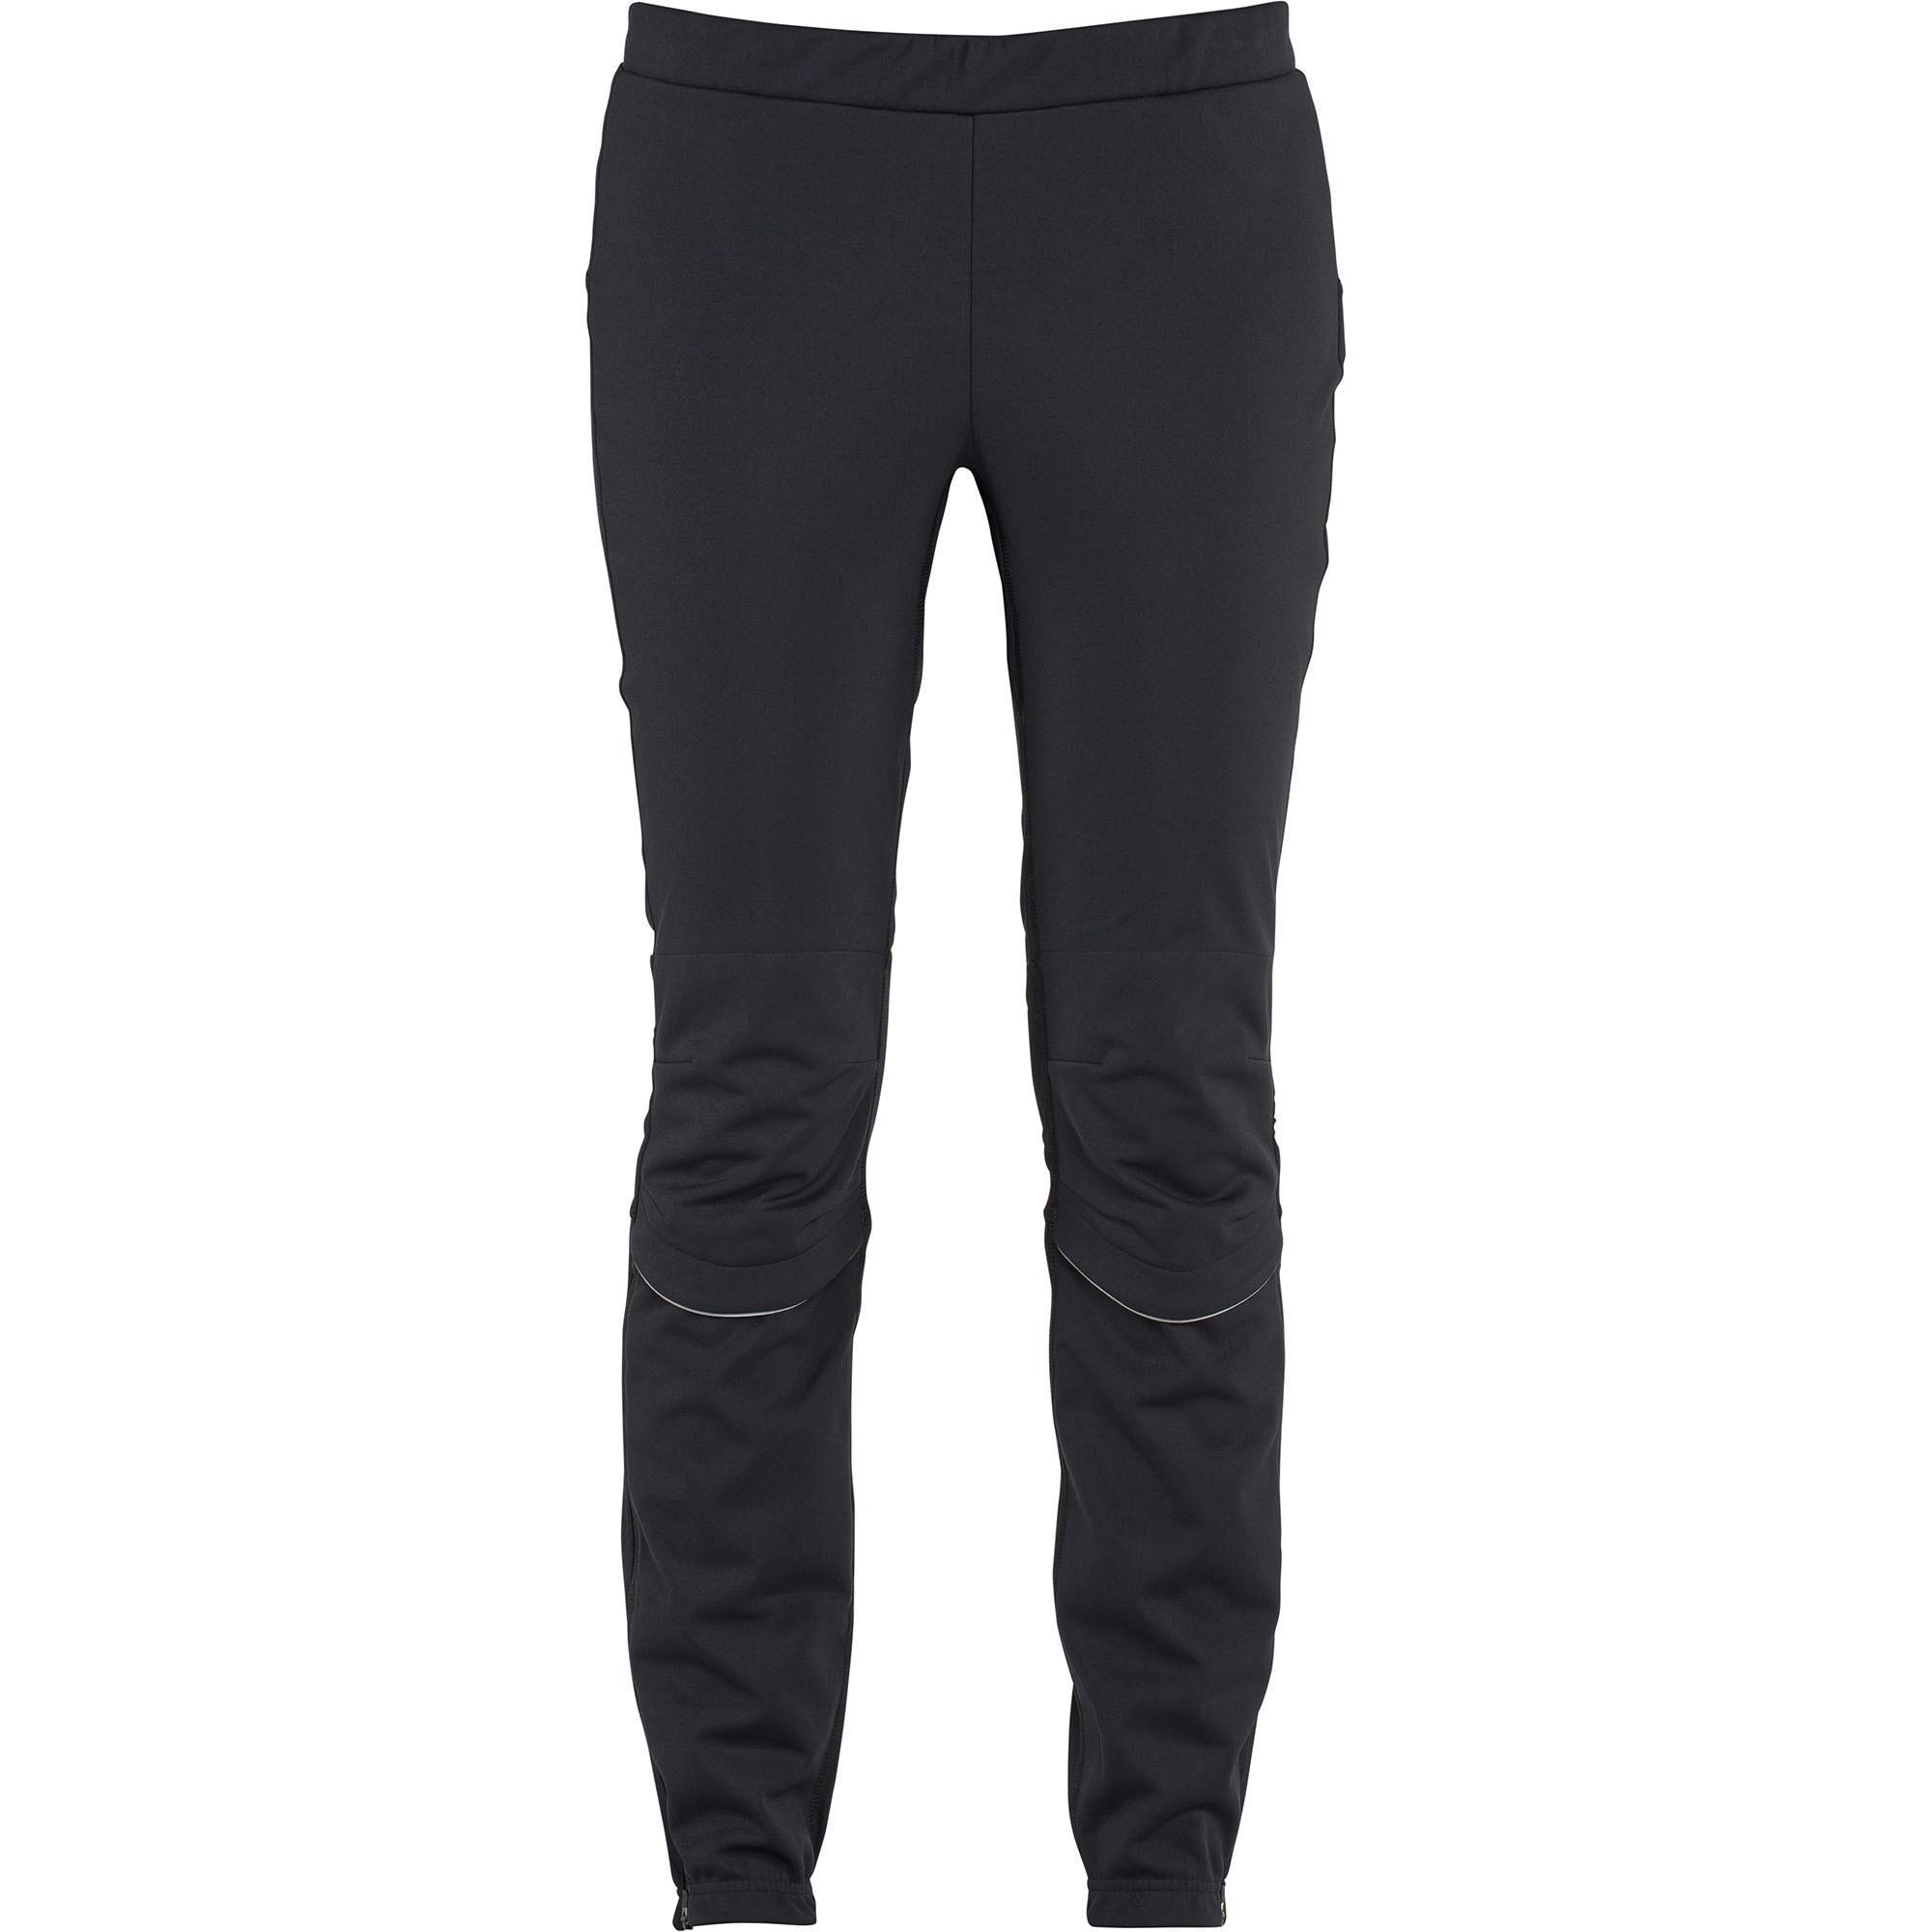 softshell pantalon pantalon softshell homme homme pulse pulse black q7ItnwgW